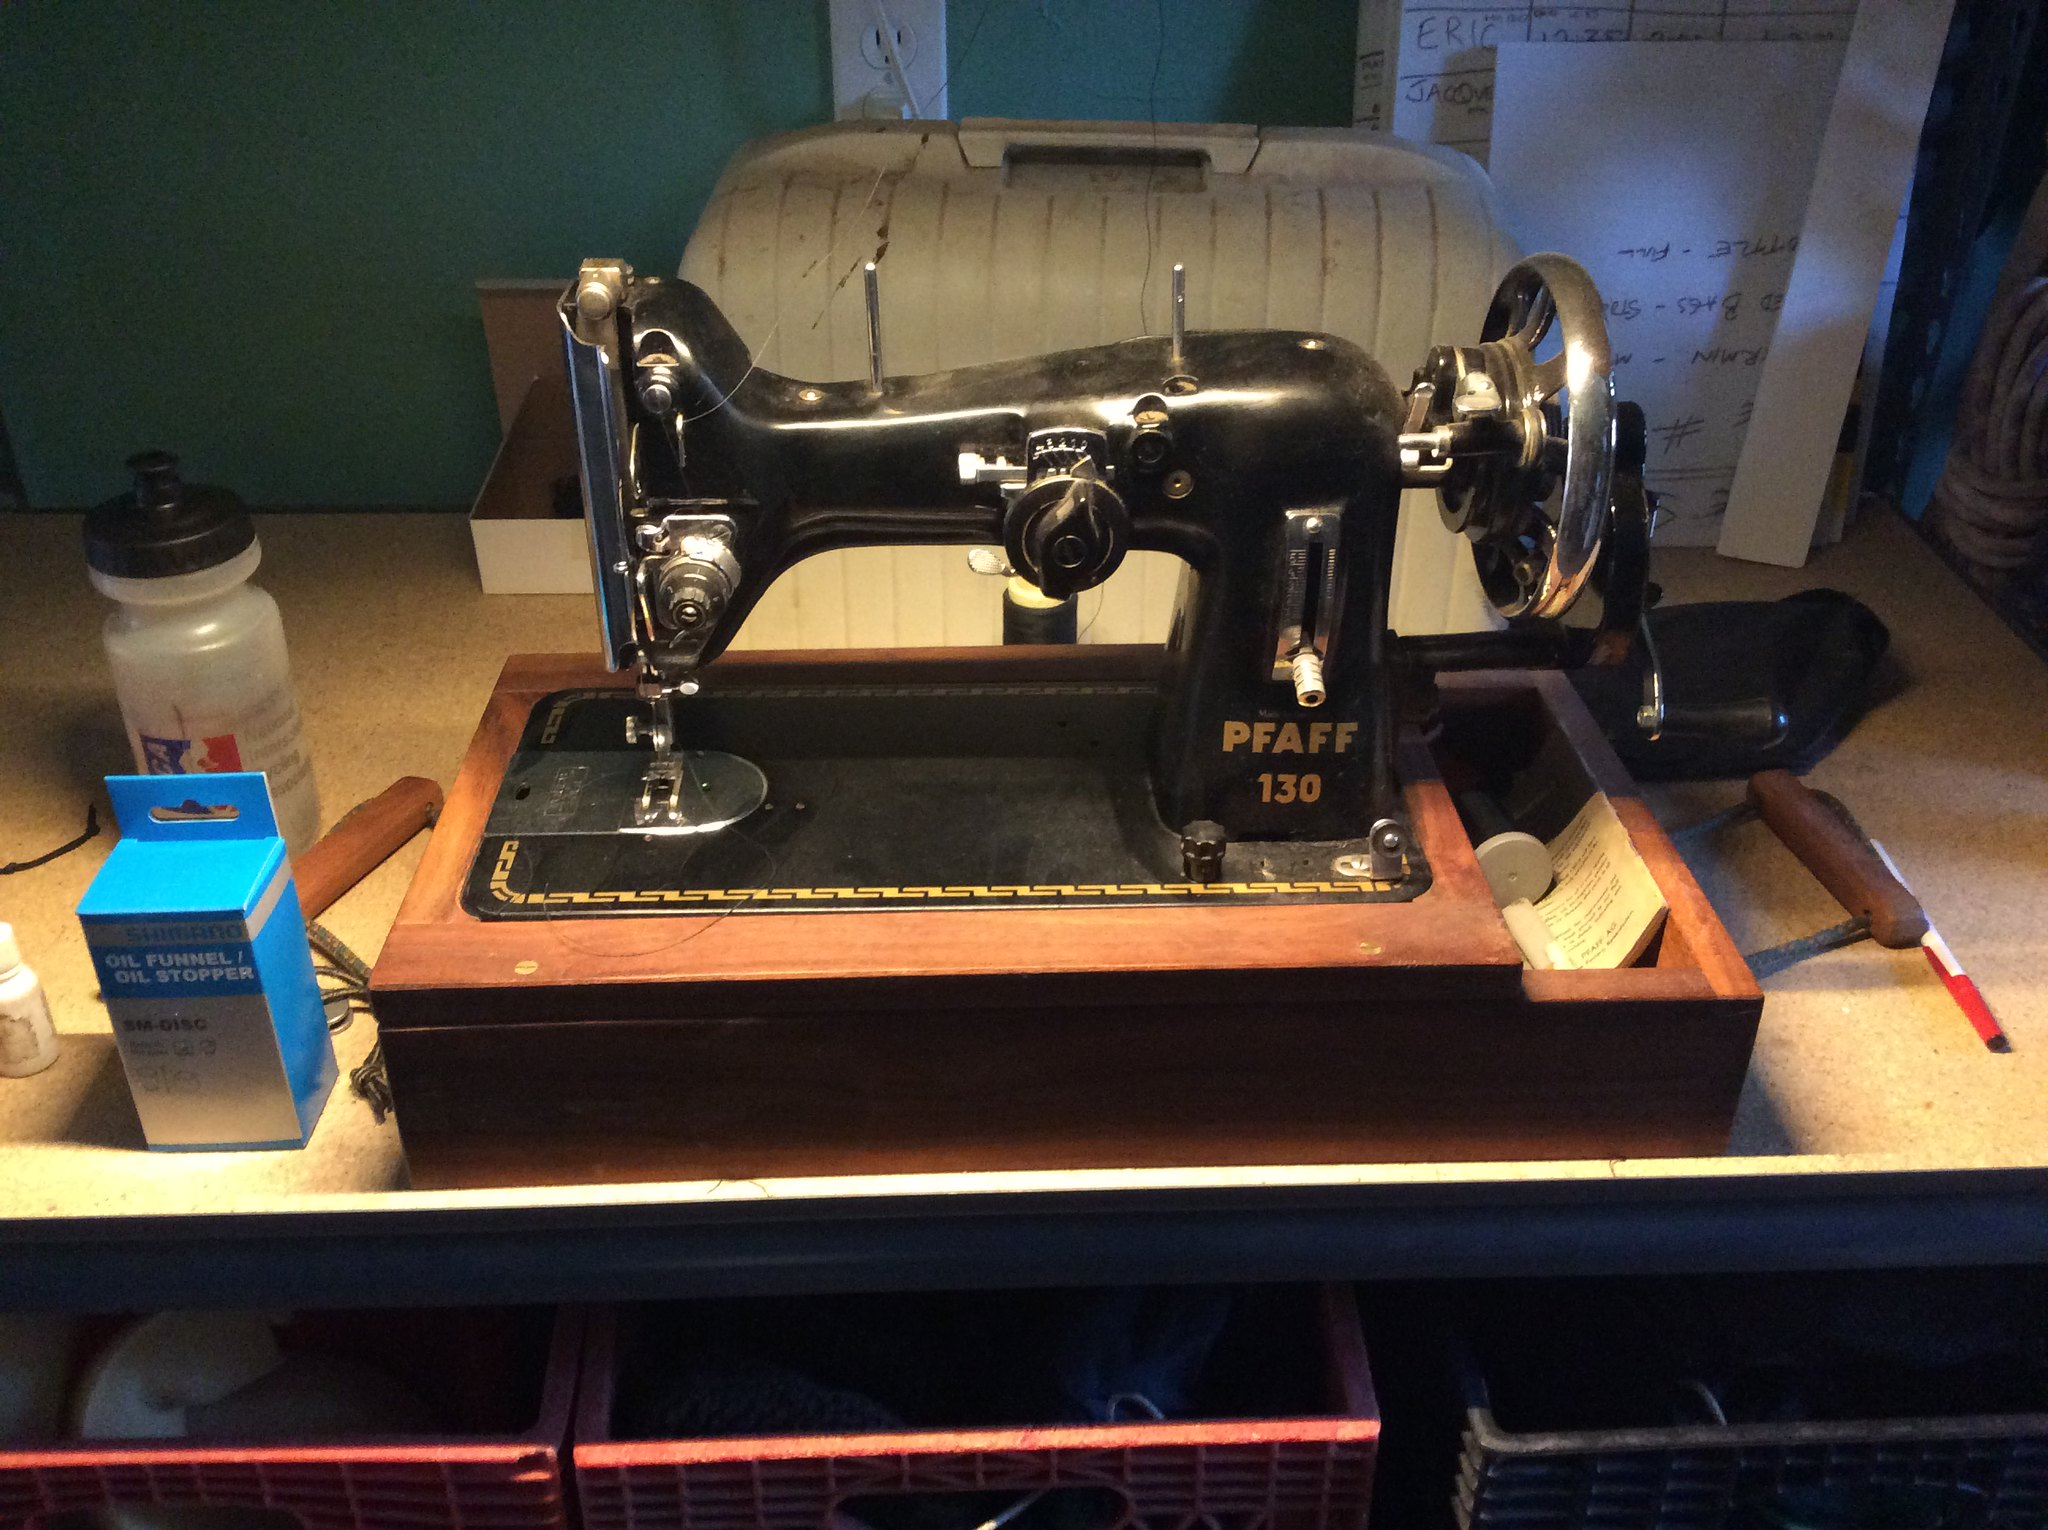 Vintage Sewing Machines For Diy Bikepacking Gear Mtbrcom Necchi Bu Machine Threading Diagram Image By Kullaberg631 On Flickr